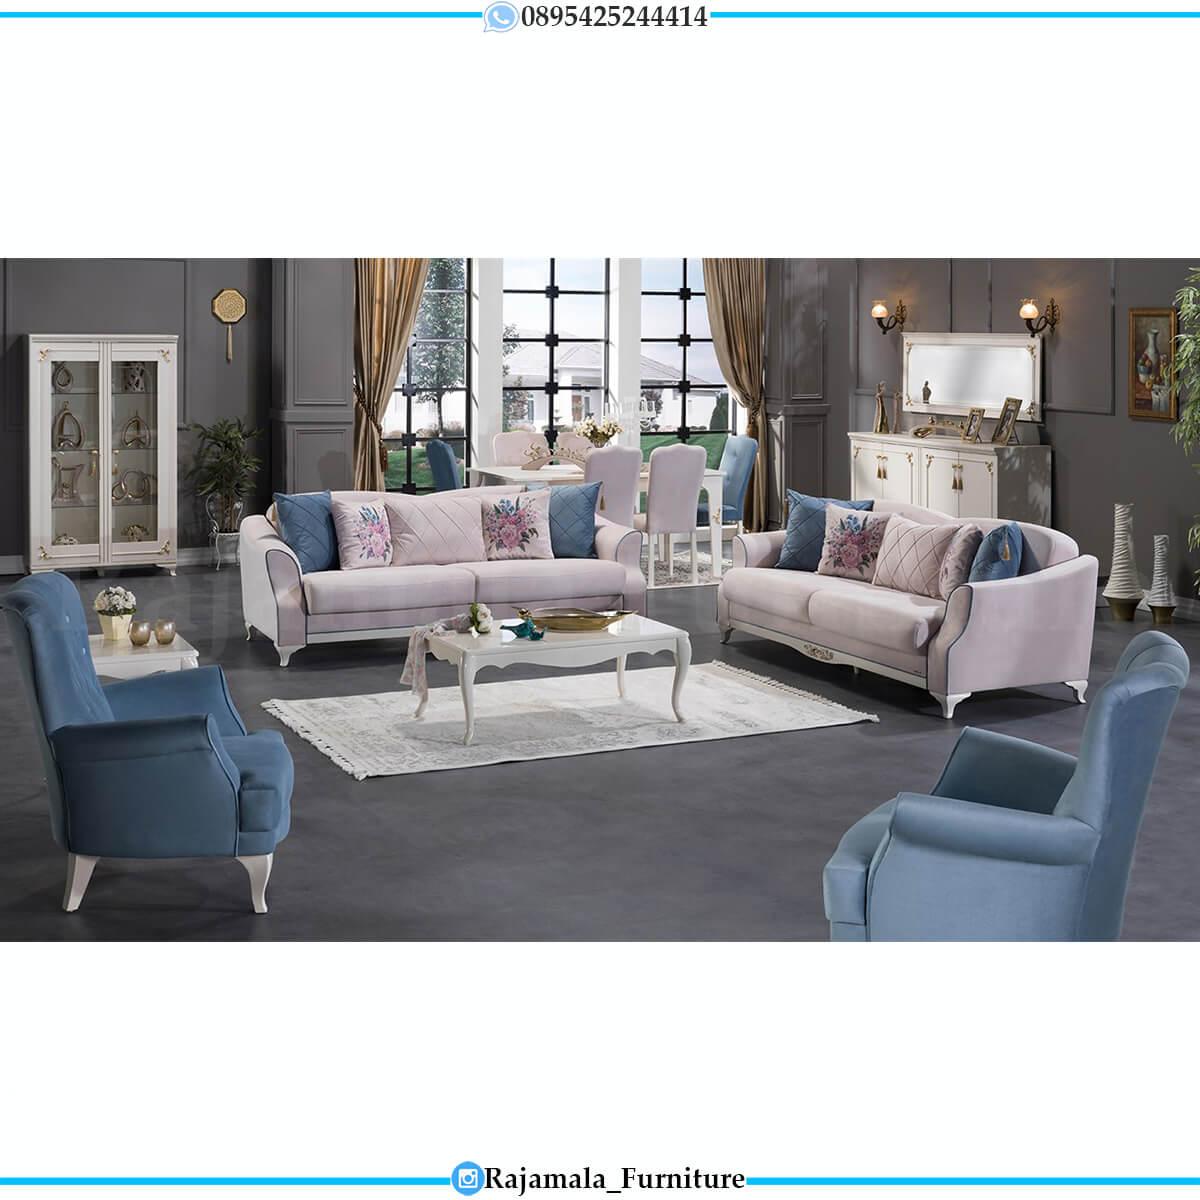 New Set Sofa Tamu Minimalis Jepara Putih Duco Excellent Color RM-0628